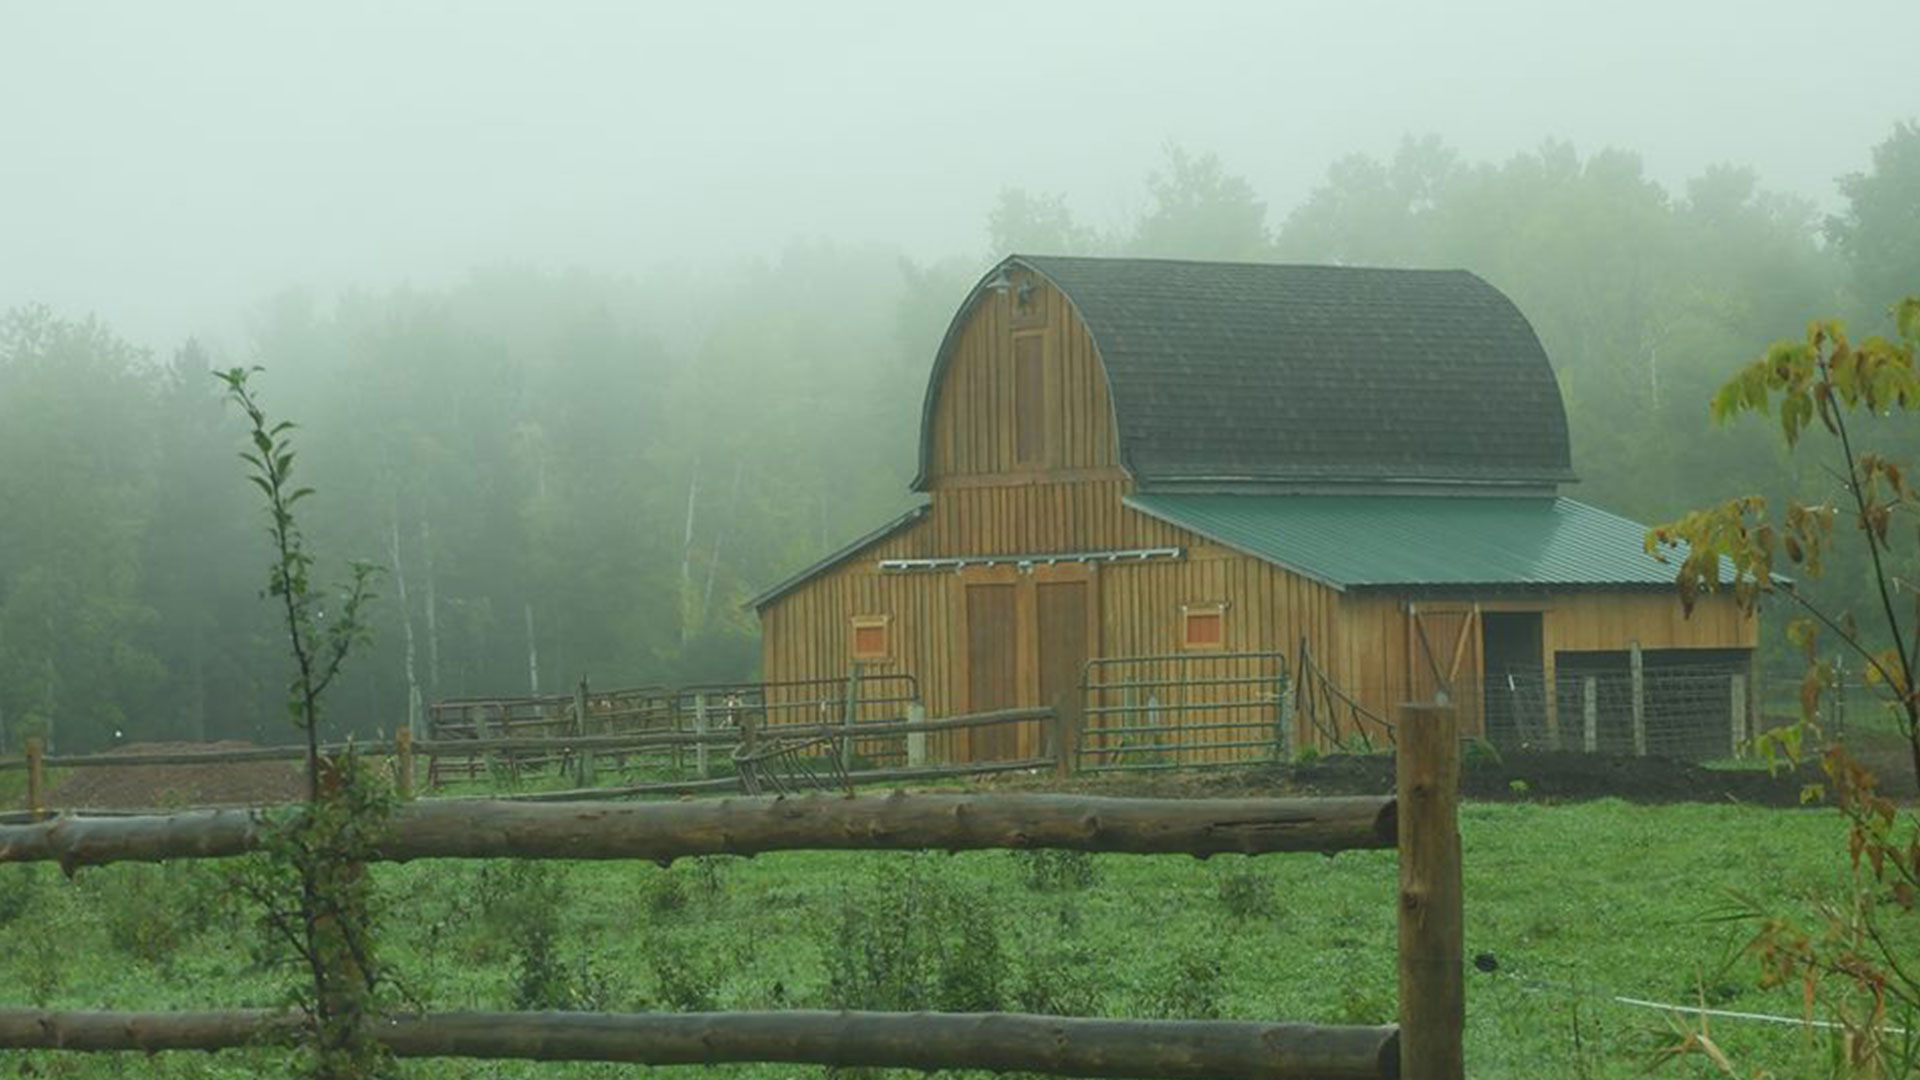 Minstry Barn | Second Wind Country Inn, Ashland, WI